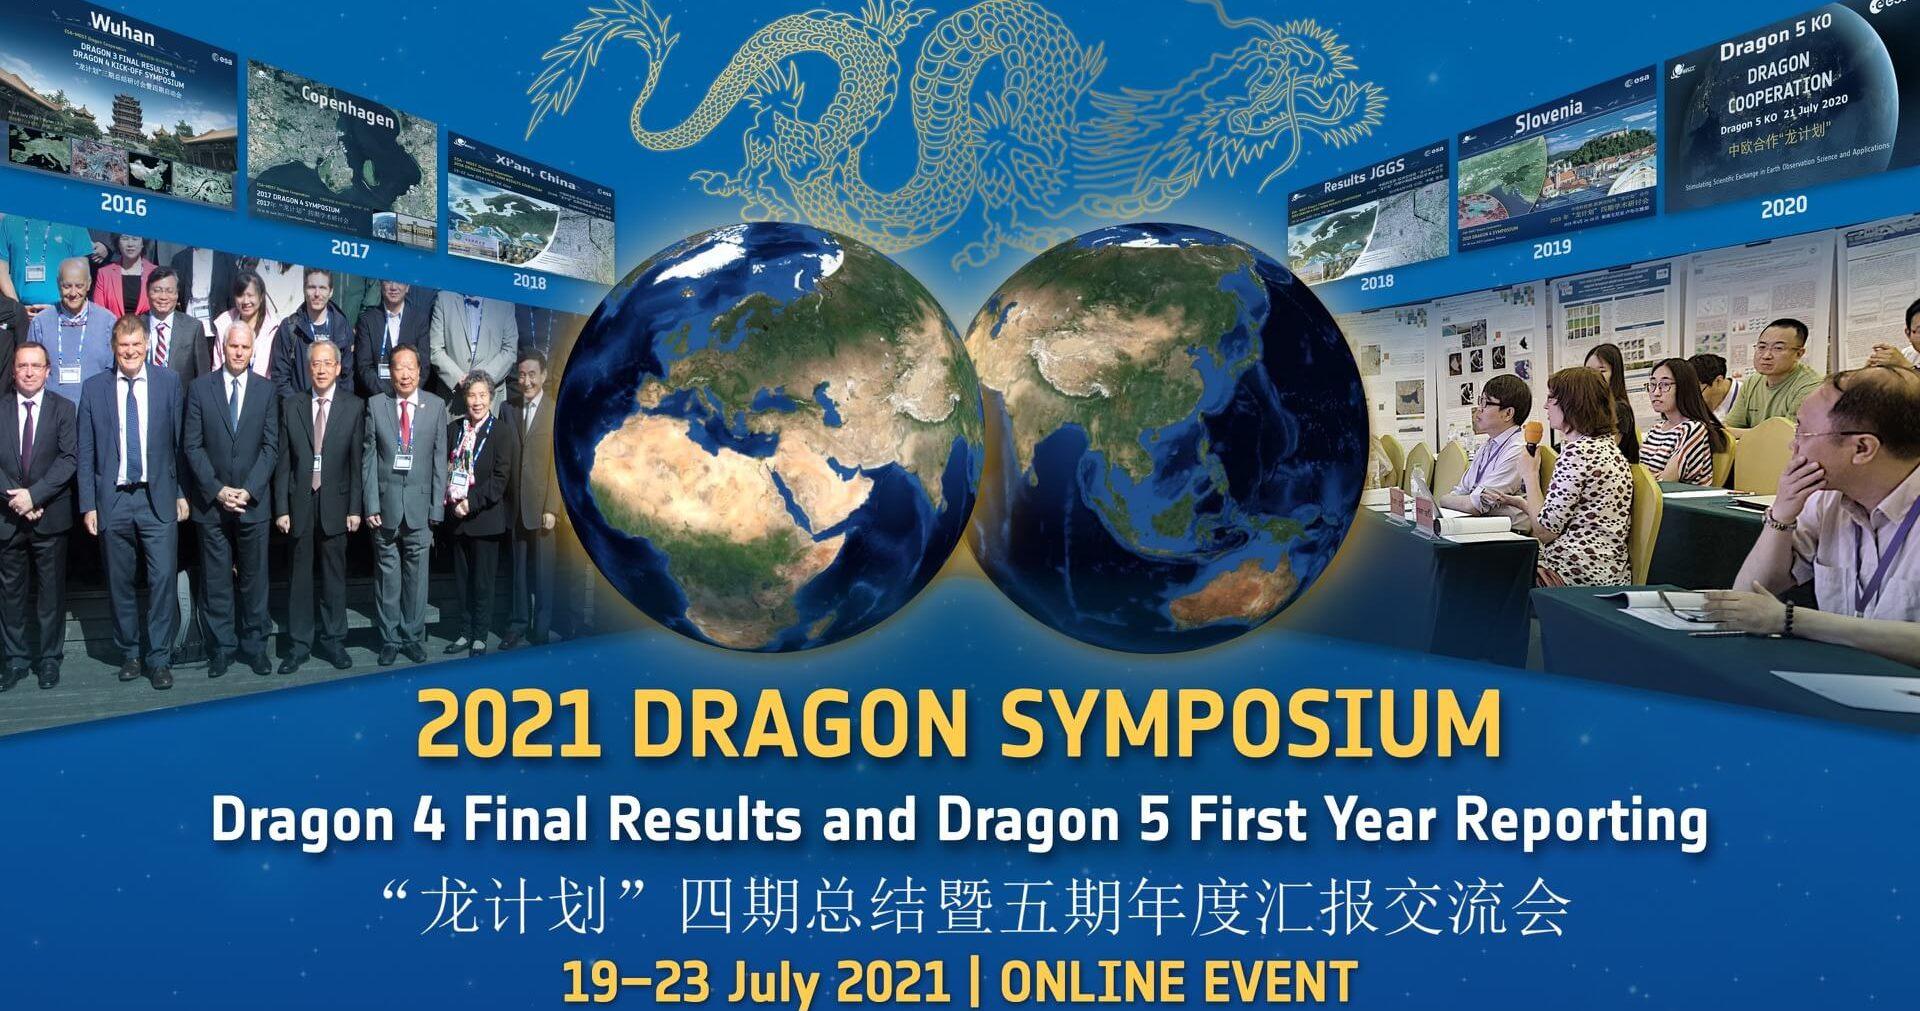 2021 Dragon Symposium